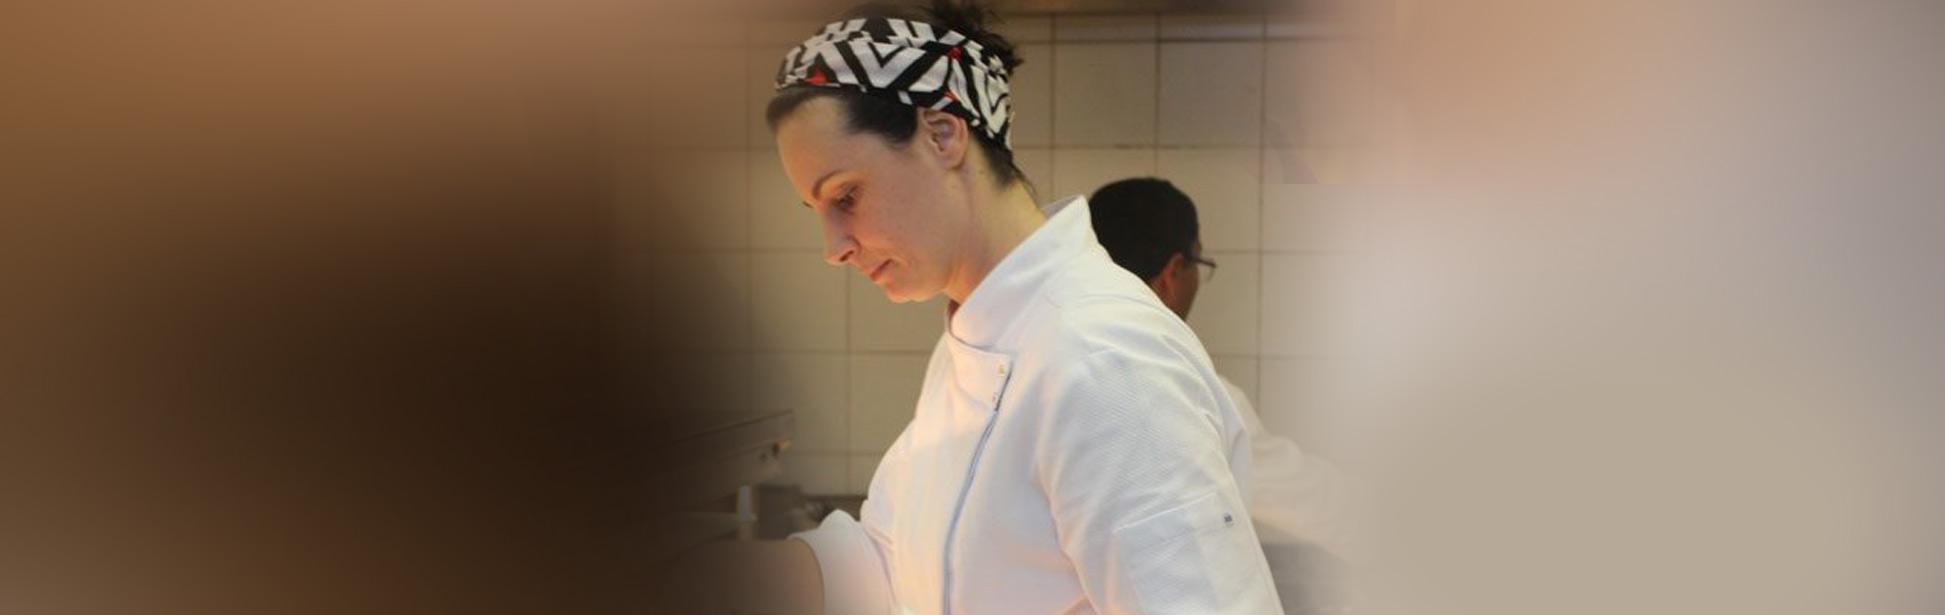 Chef Mariana Turchetti